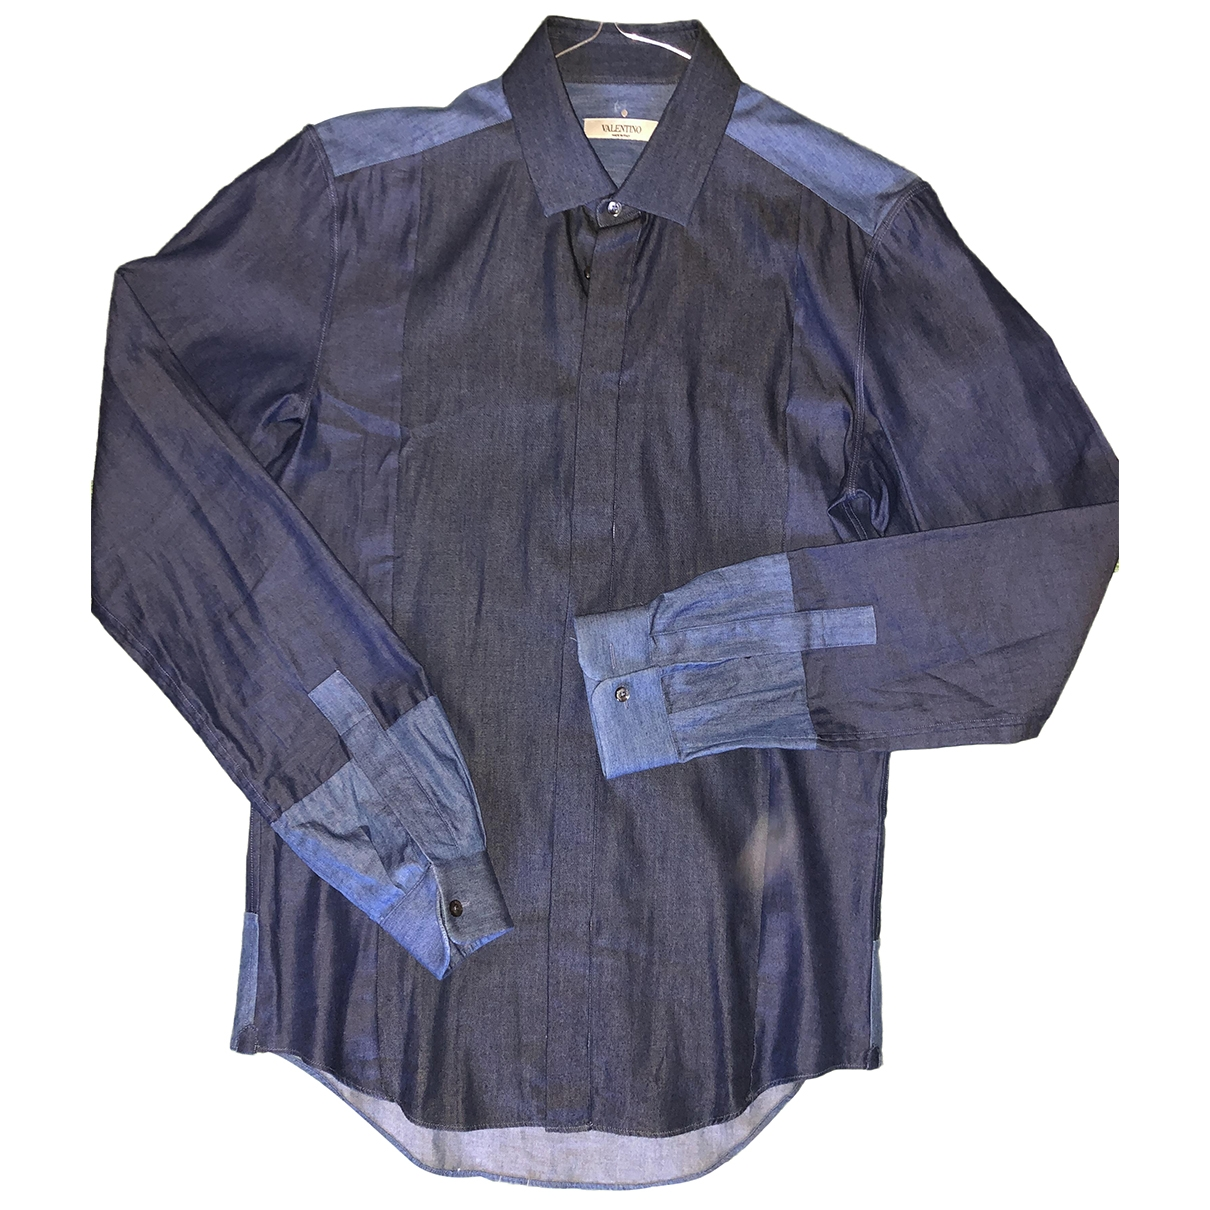 Valentino Garavani \N Navy Denim - Jeans Shirts for Men 37 EU (tour de cou / collar)